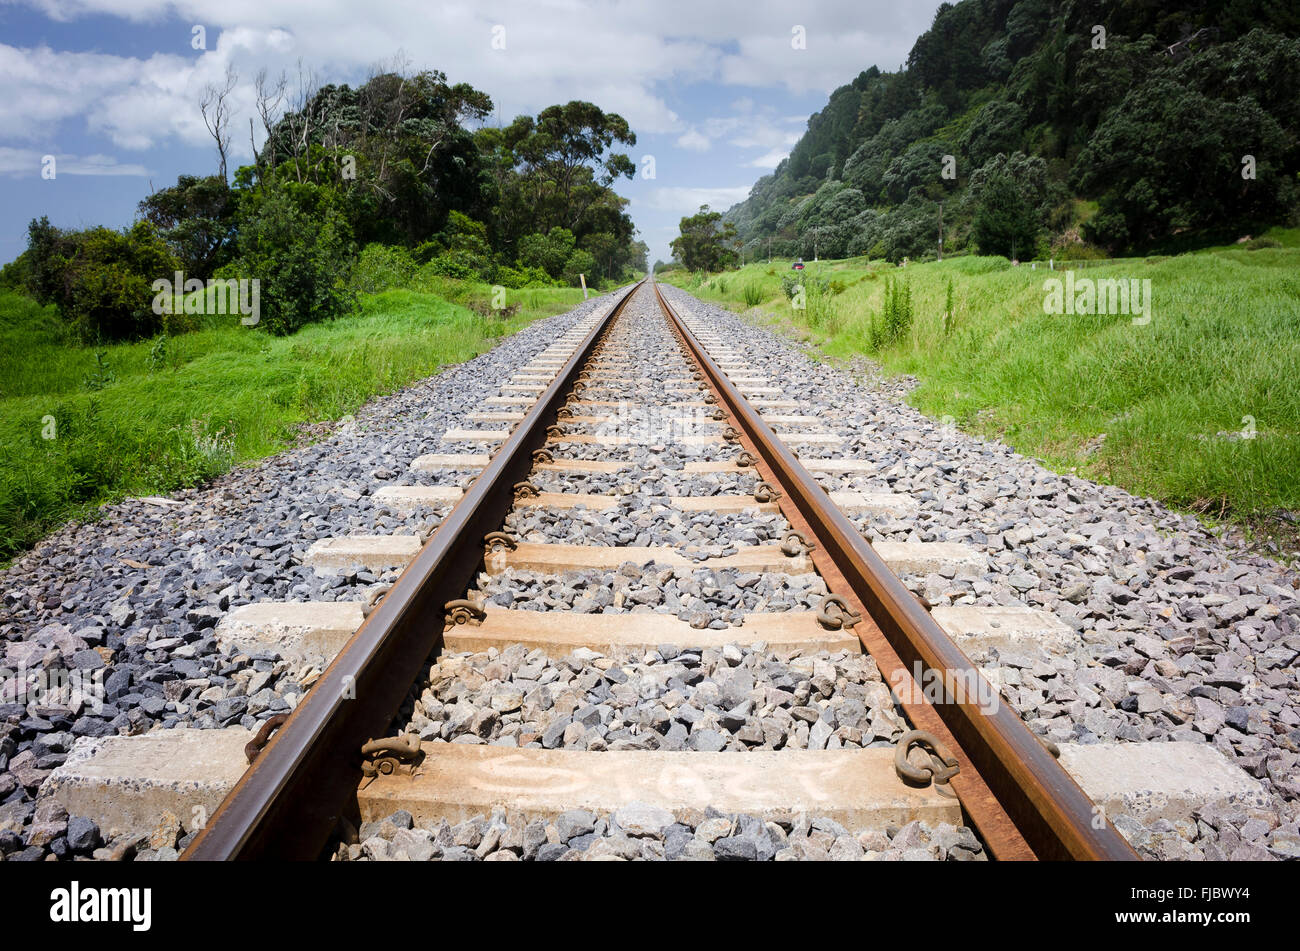 Railroad tracks, South Island, New Zealand - Stock Image